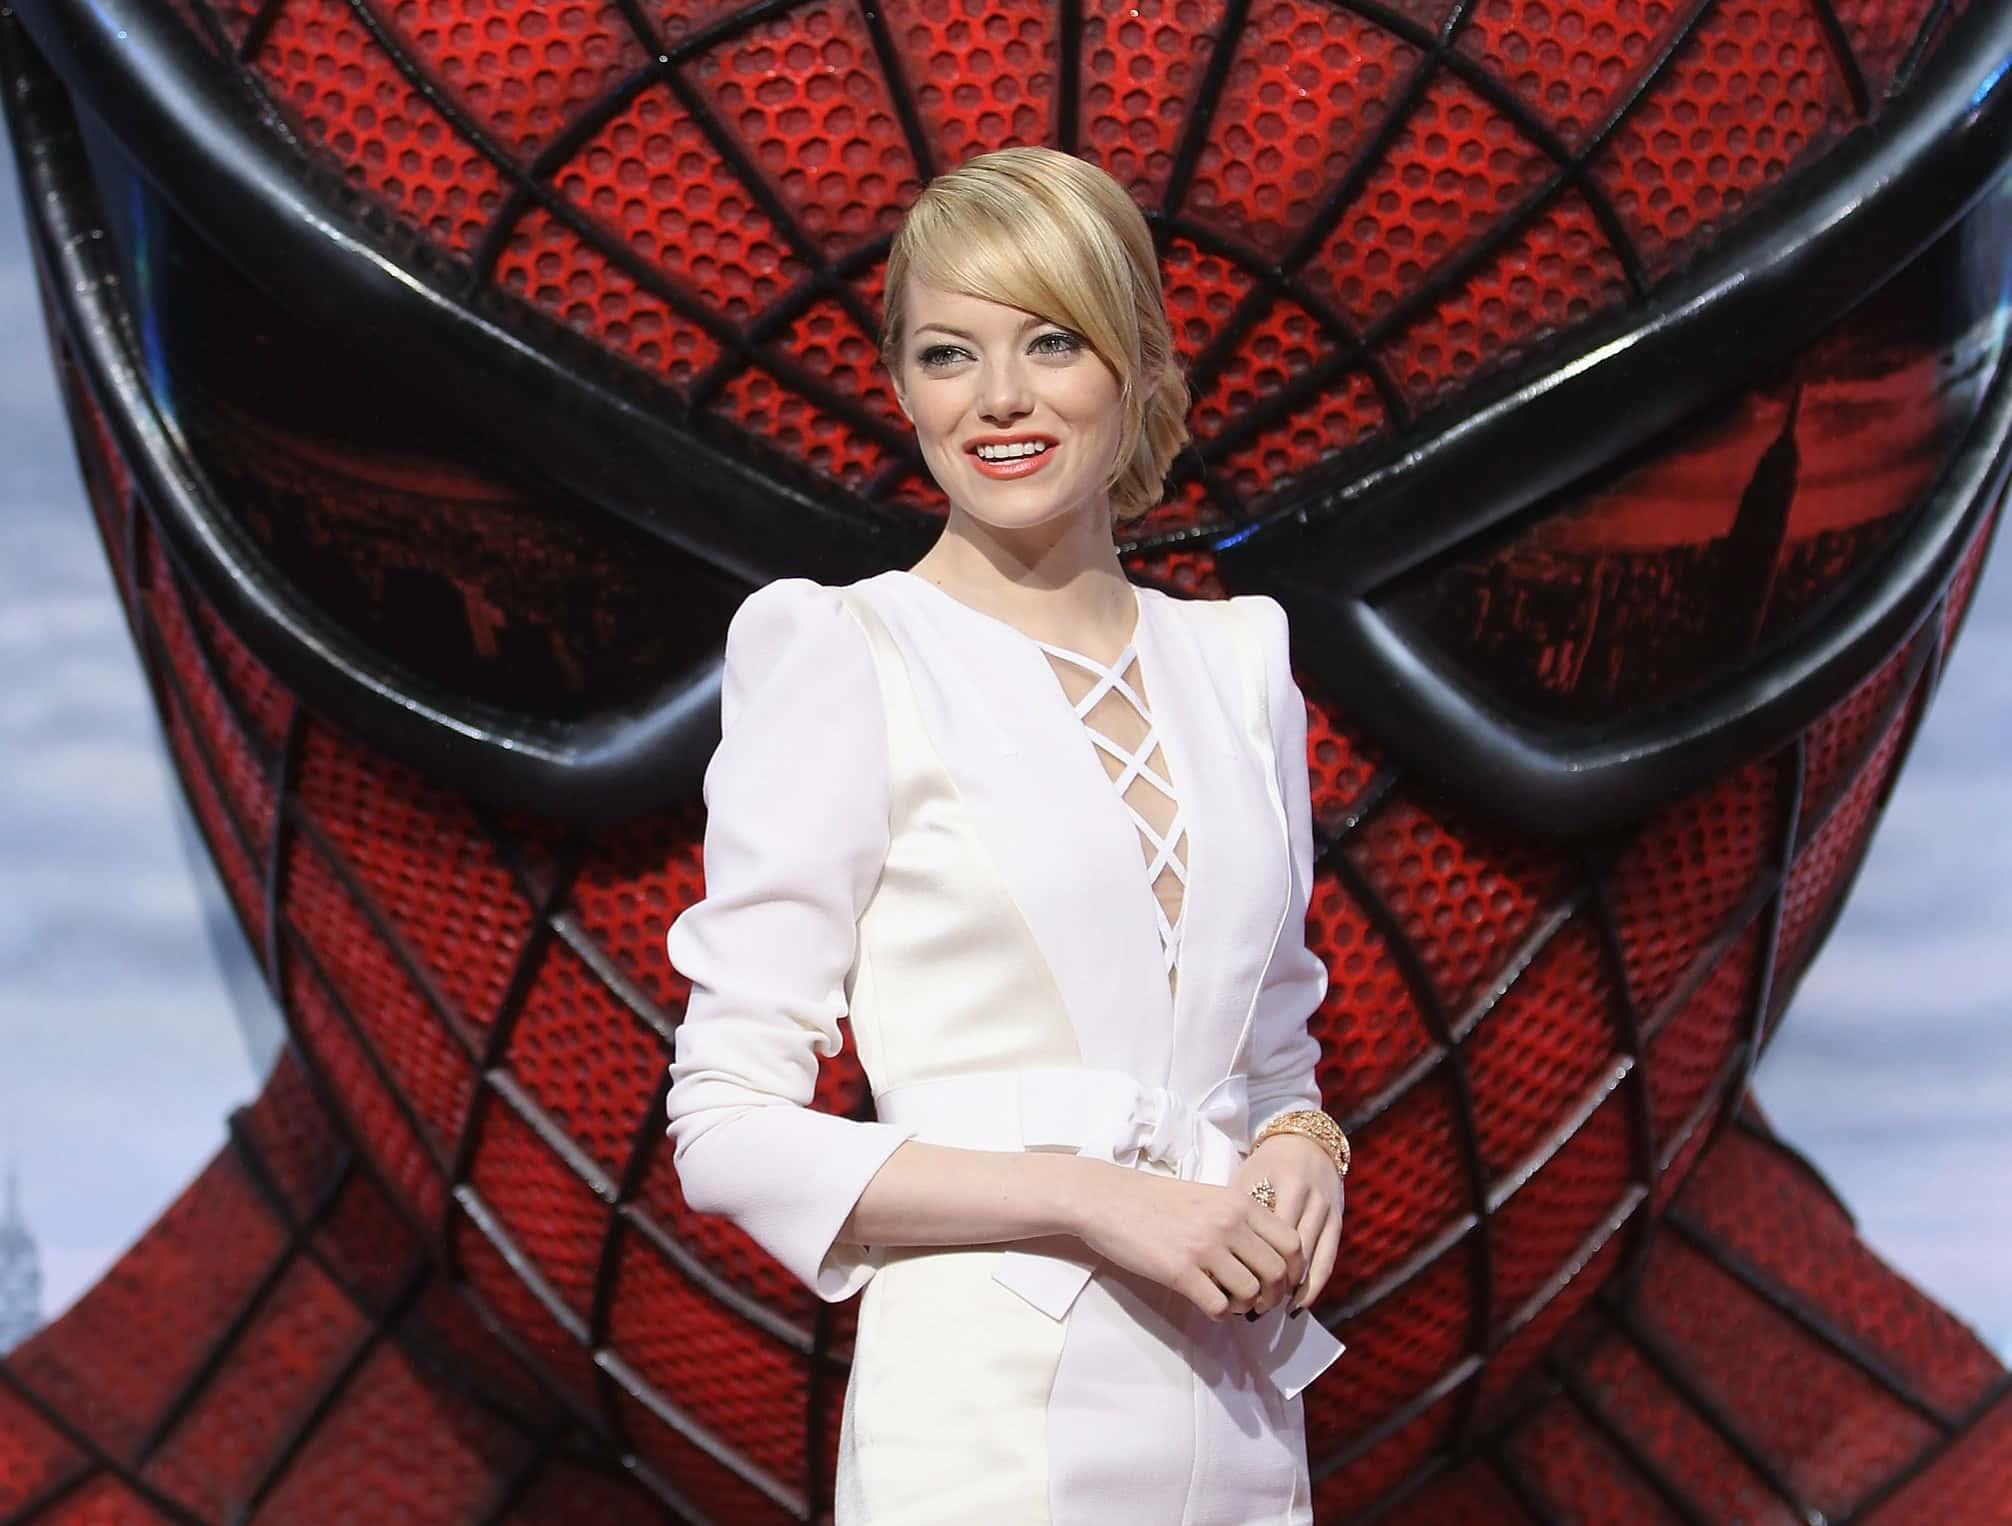 Spider-Man Movies Facts